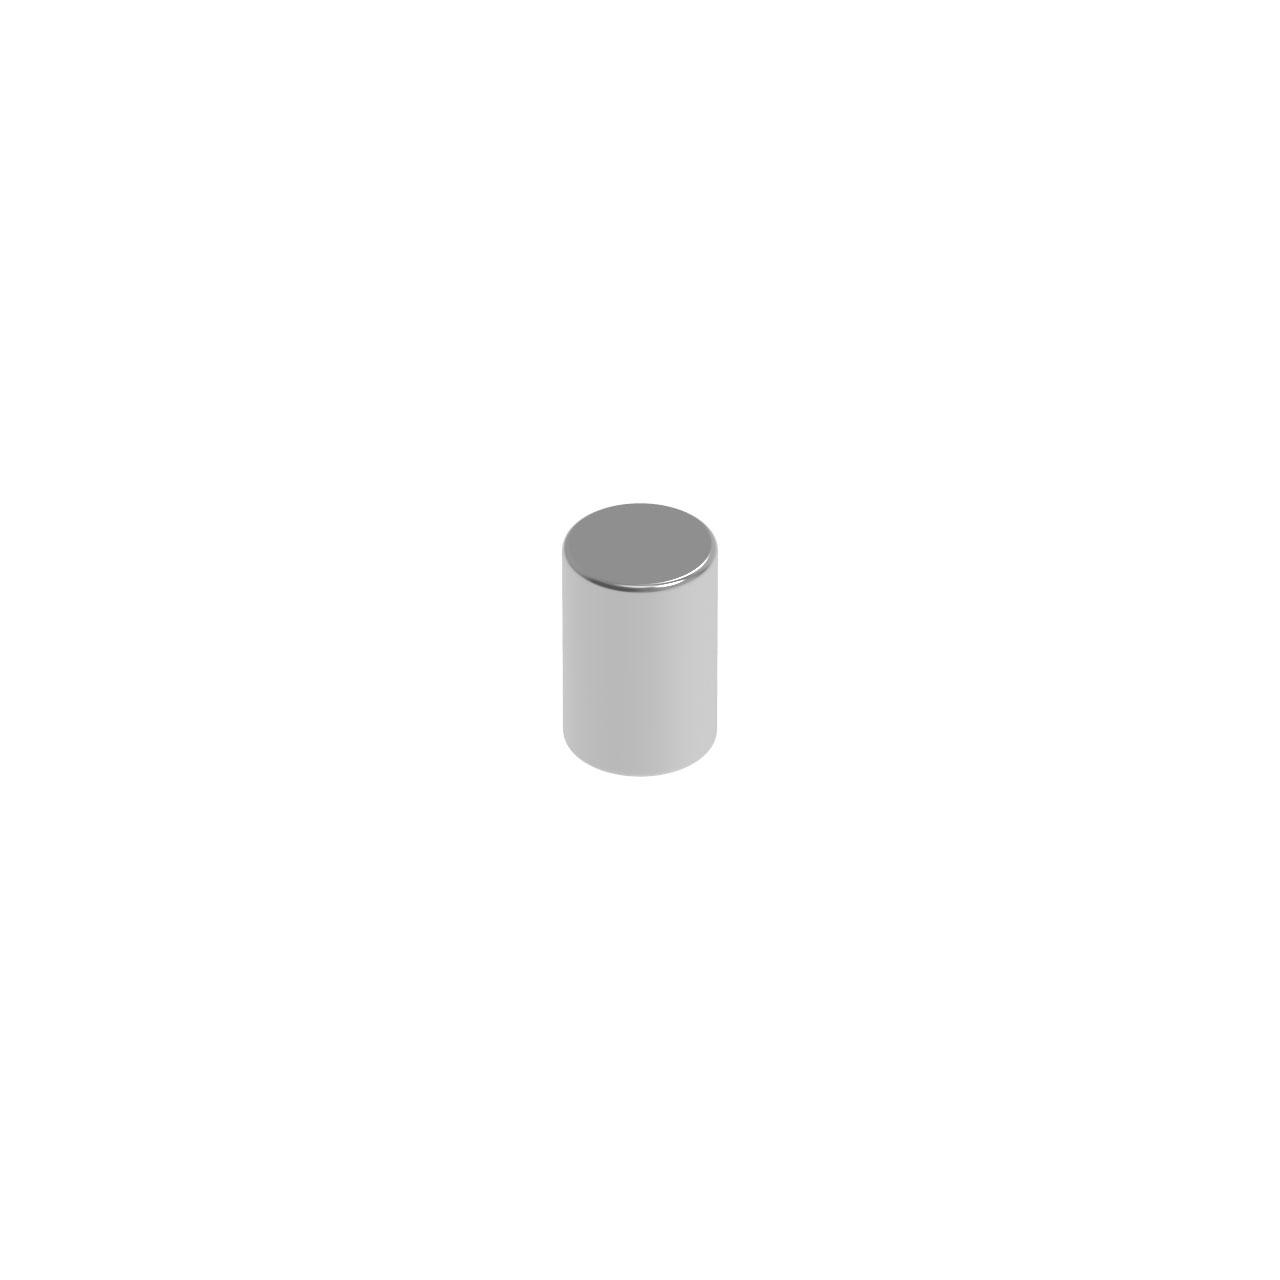 HIQPARTS(ハイキューパーツ) ネオジム磁石 N52 丸形 直径1mm x 高さ1.5mm(8個入) [MGN1015A] 4573211370683